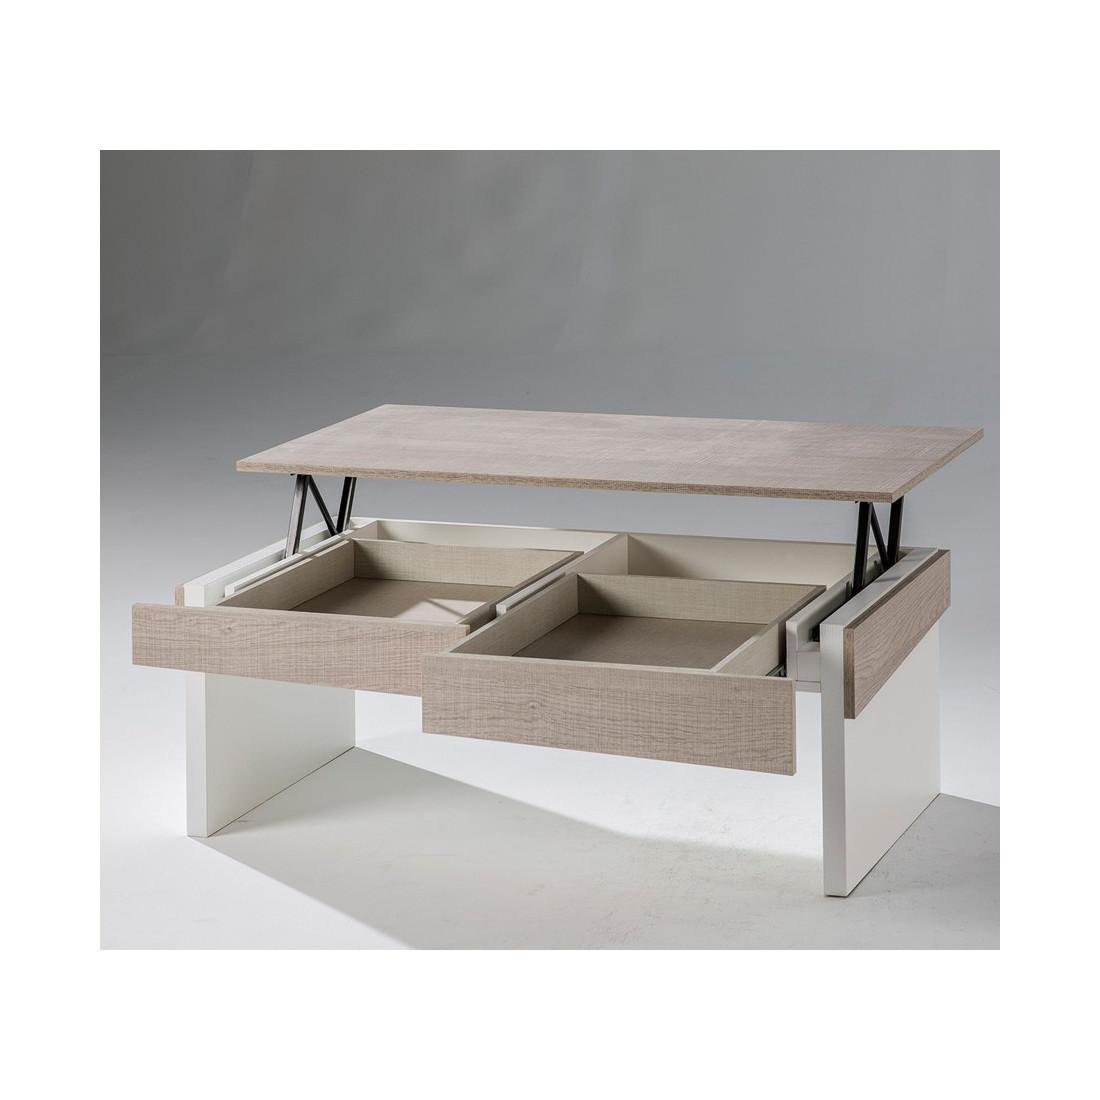 Basse Clair Moderne Table Relevable Du Chêne Berliose Univers Salon wiuTklXZOP